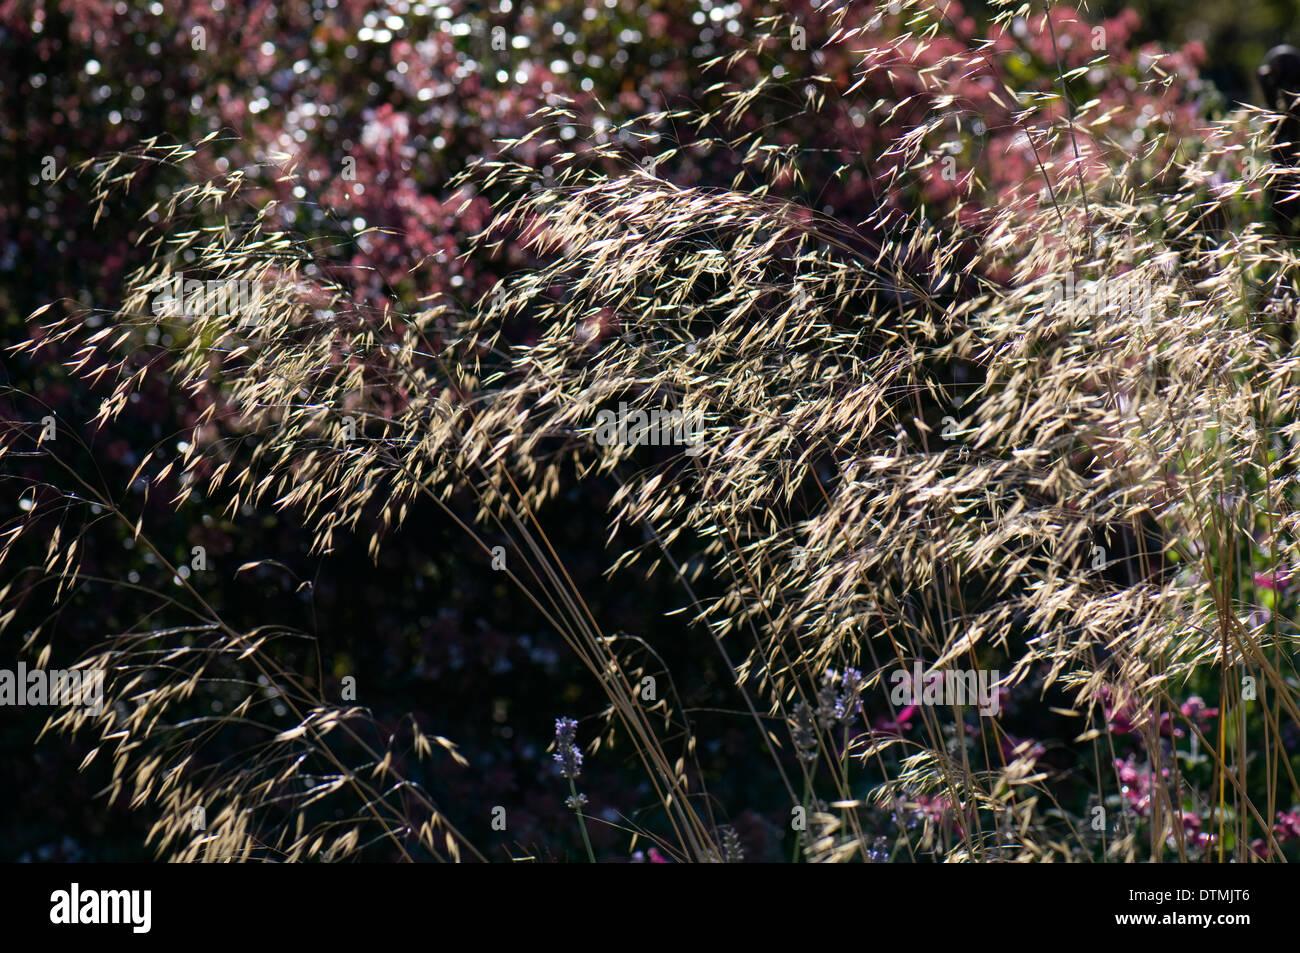 Ornamental grass rhs wisley stock photos ornamental grass rhs light shining through stipa gigantea wisley rhs gardens stock image workwithnaturefo